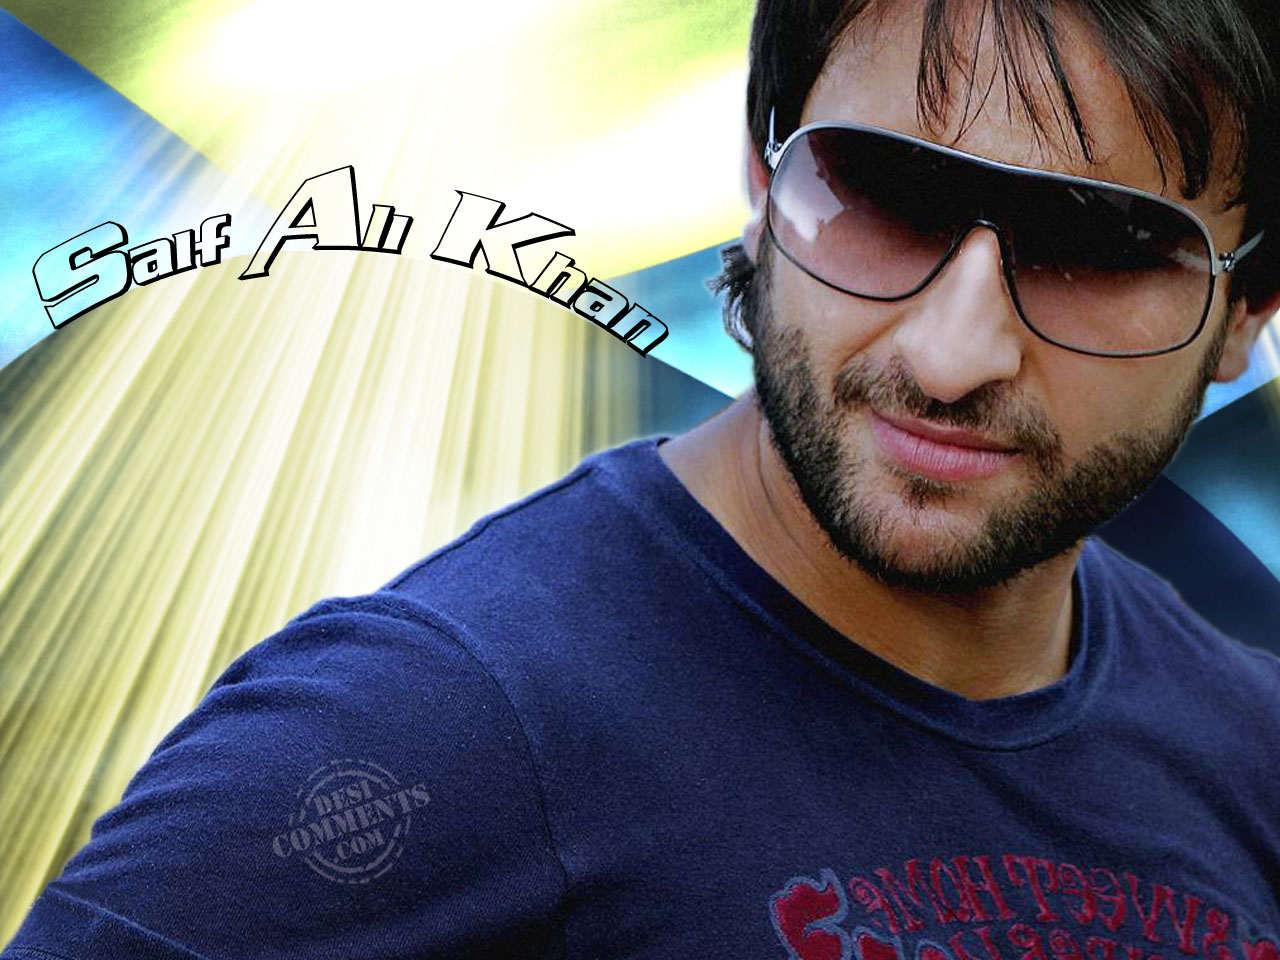 http://www.wadsam.com/wp-content/uploads/2012/12/Saif-ali-Khan.jpg